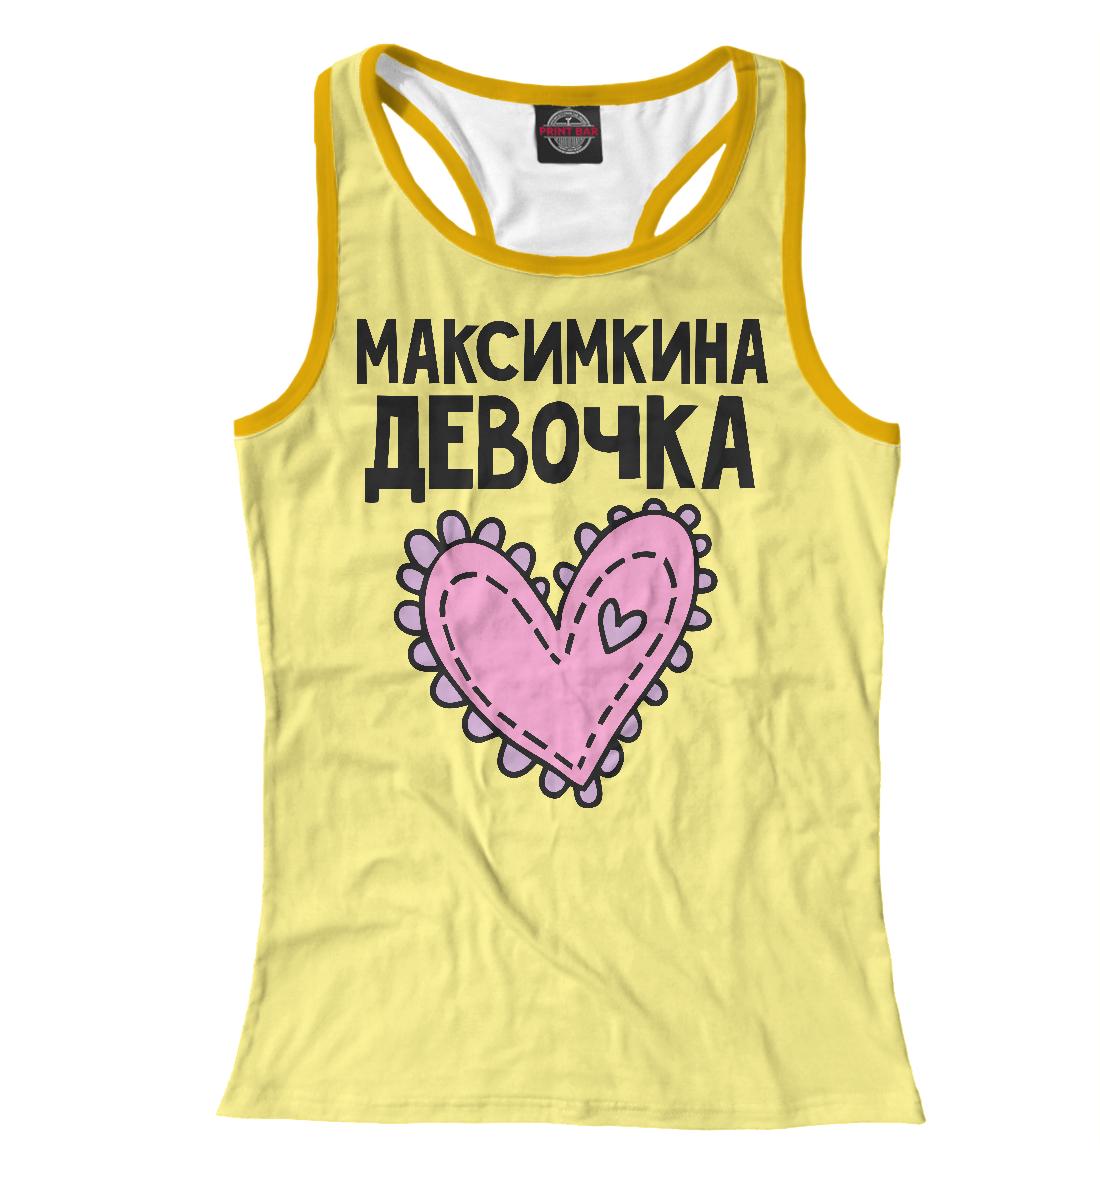 Купить Максимкина девочка, Printbar, Майки борцовки, NDP-254092-mayb-1